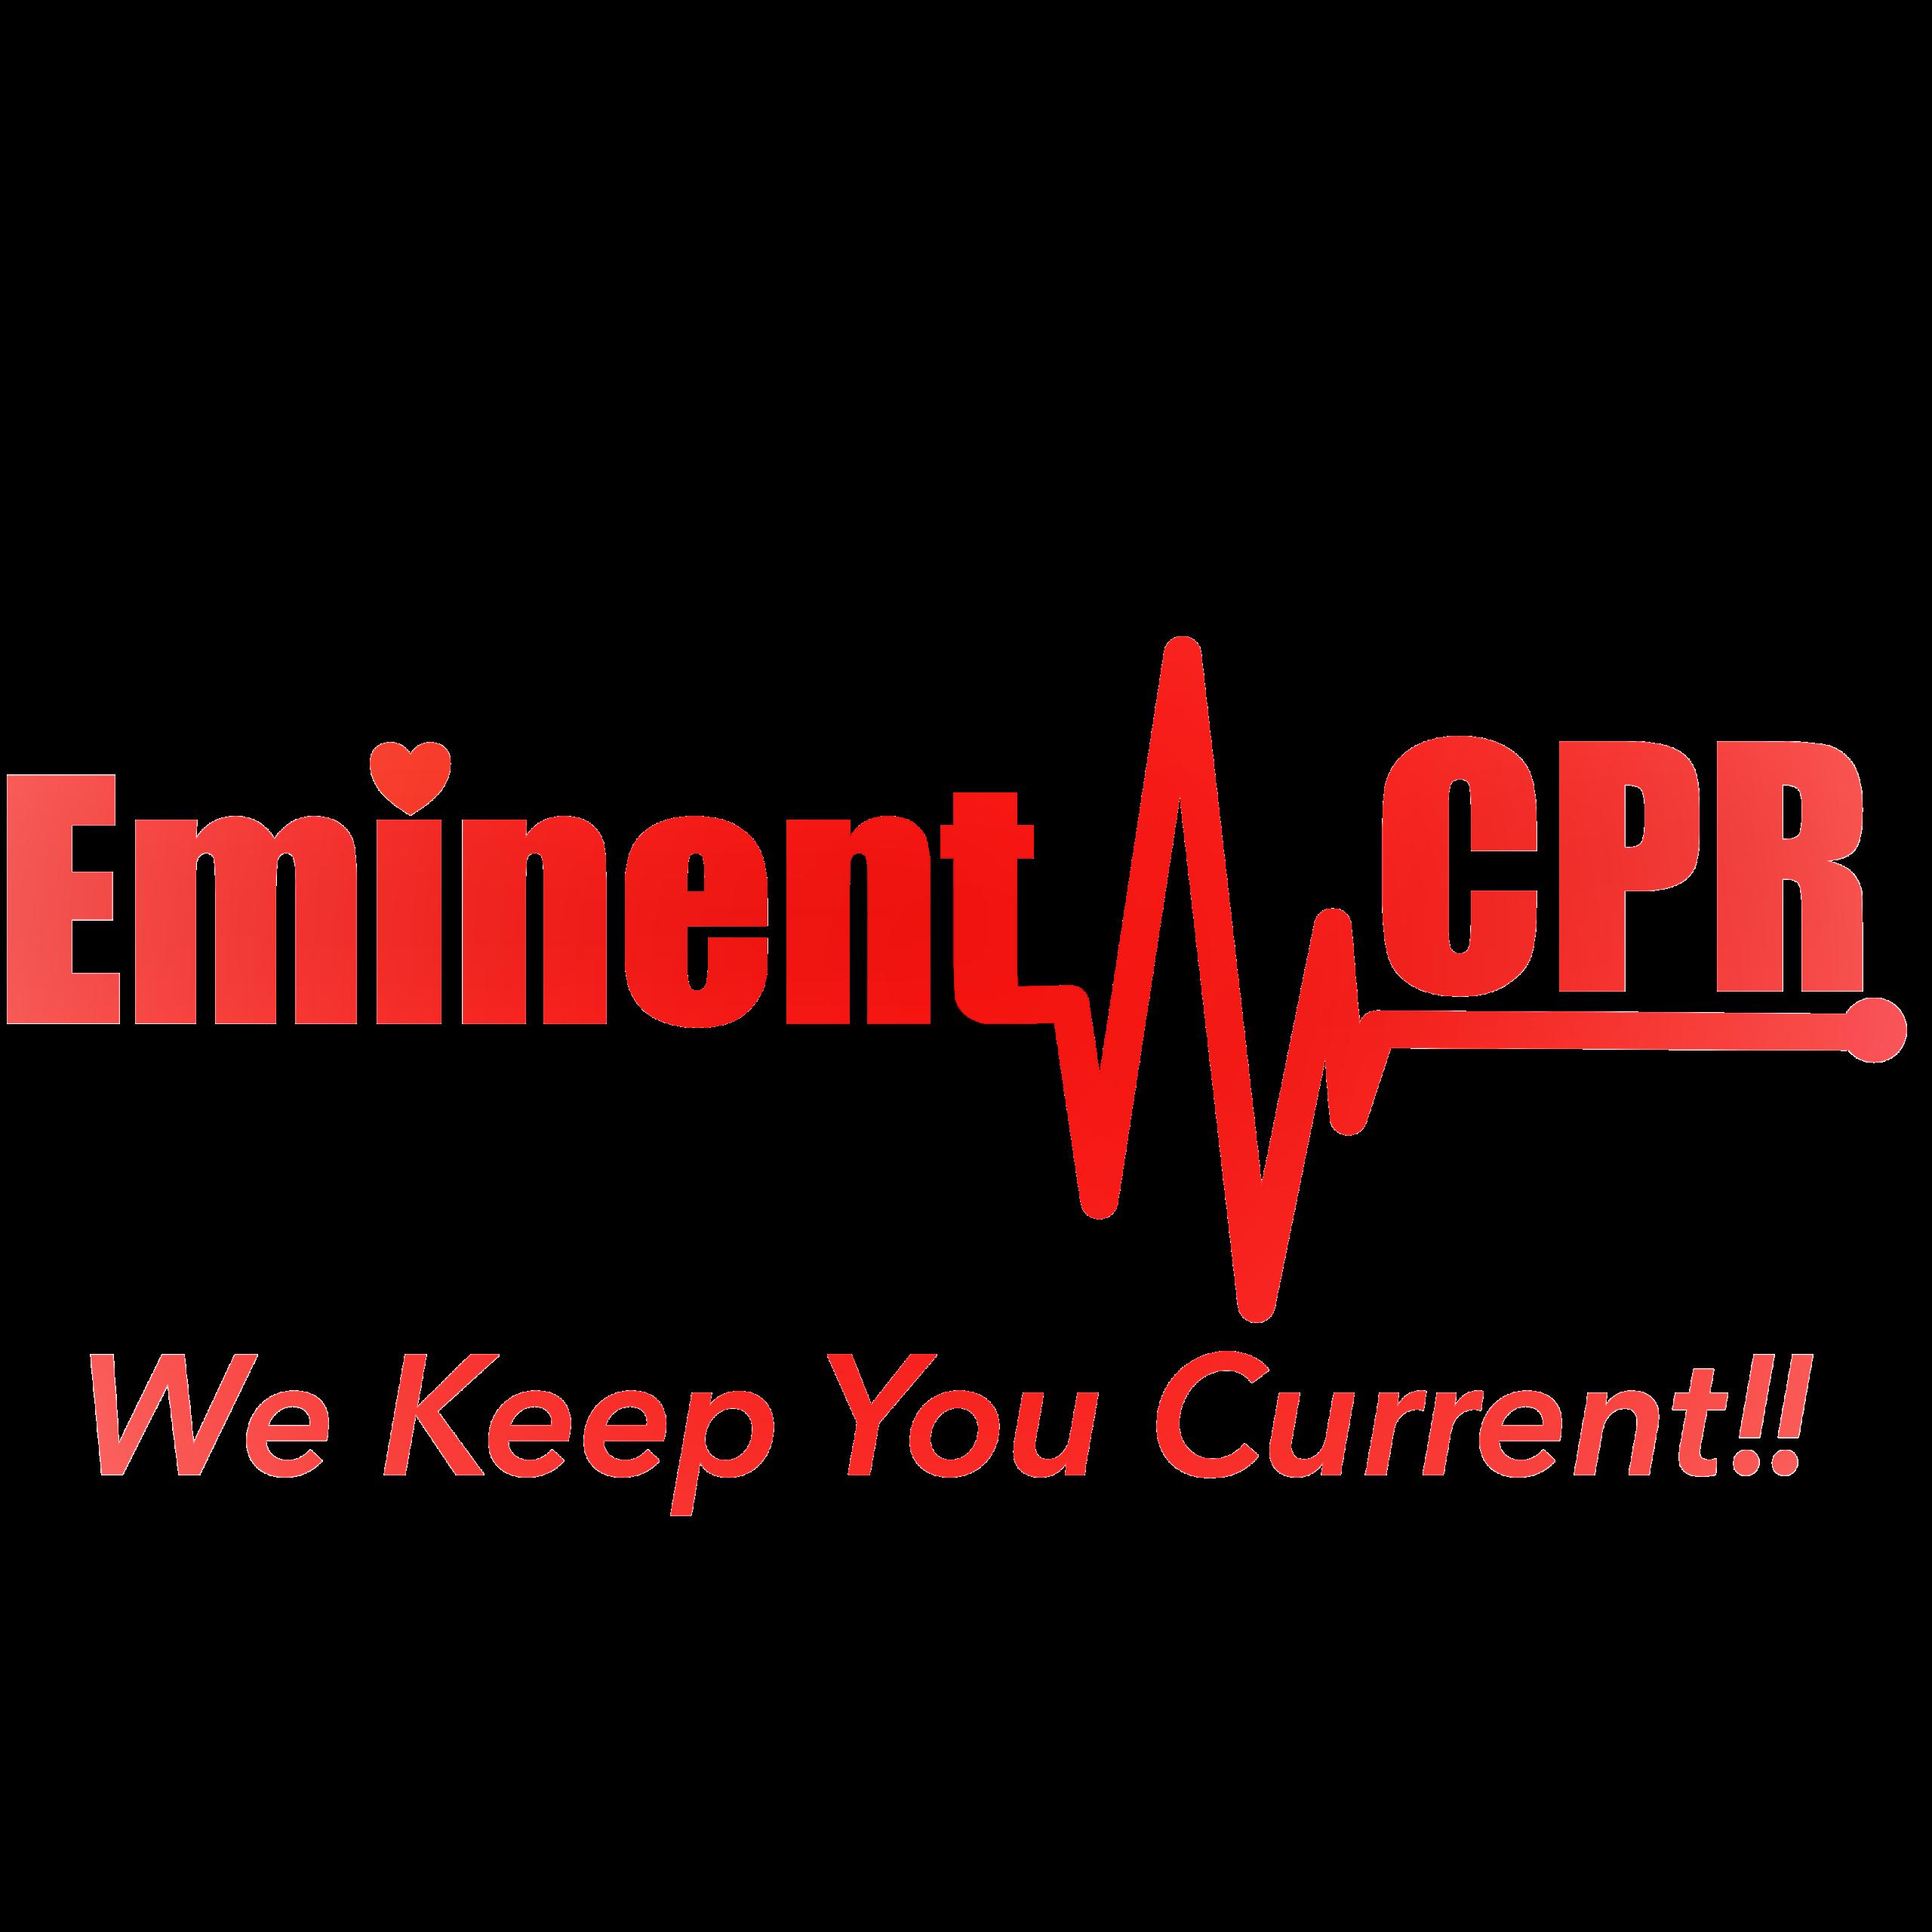 Eminent CPR logo front of website